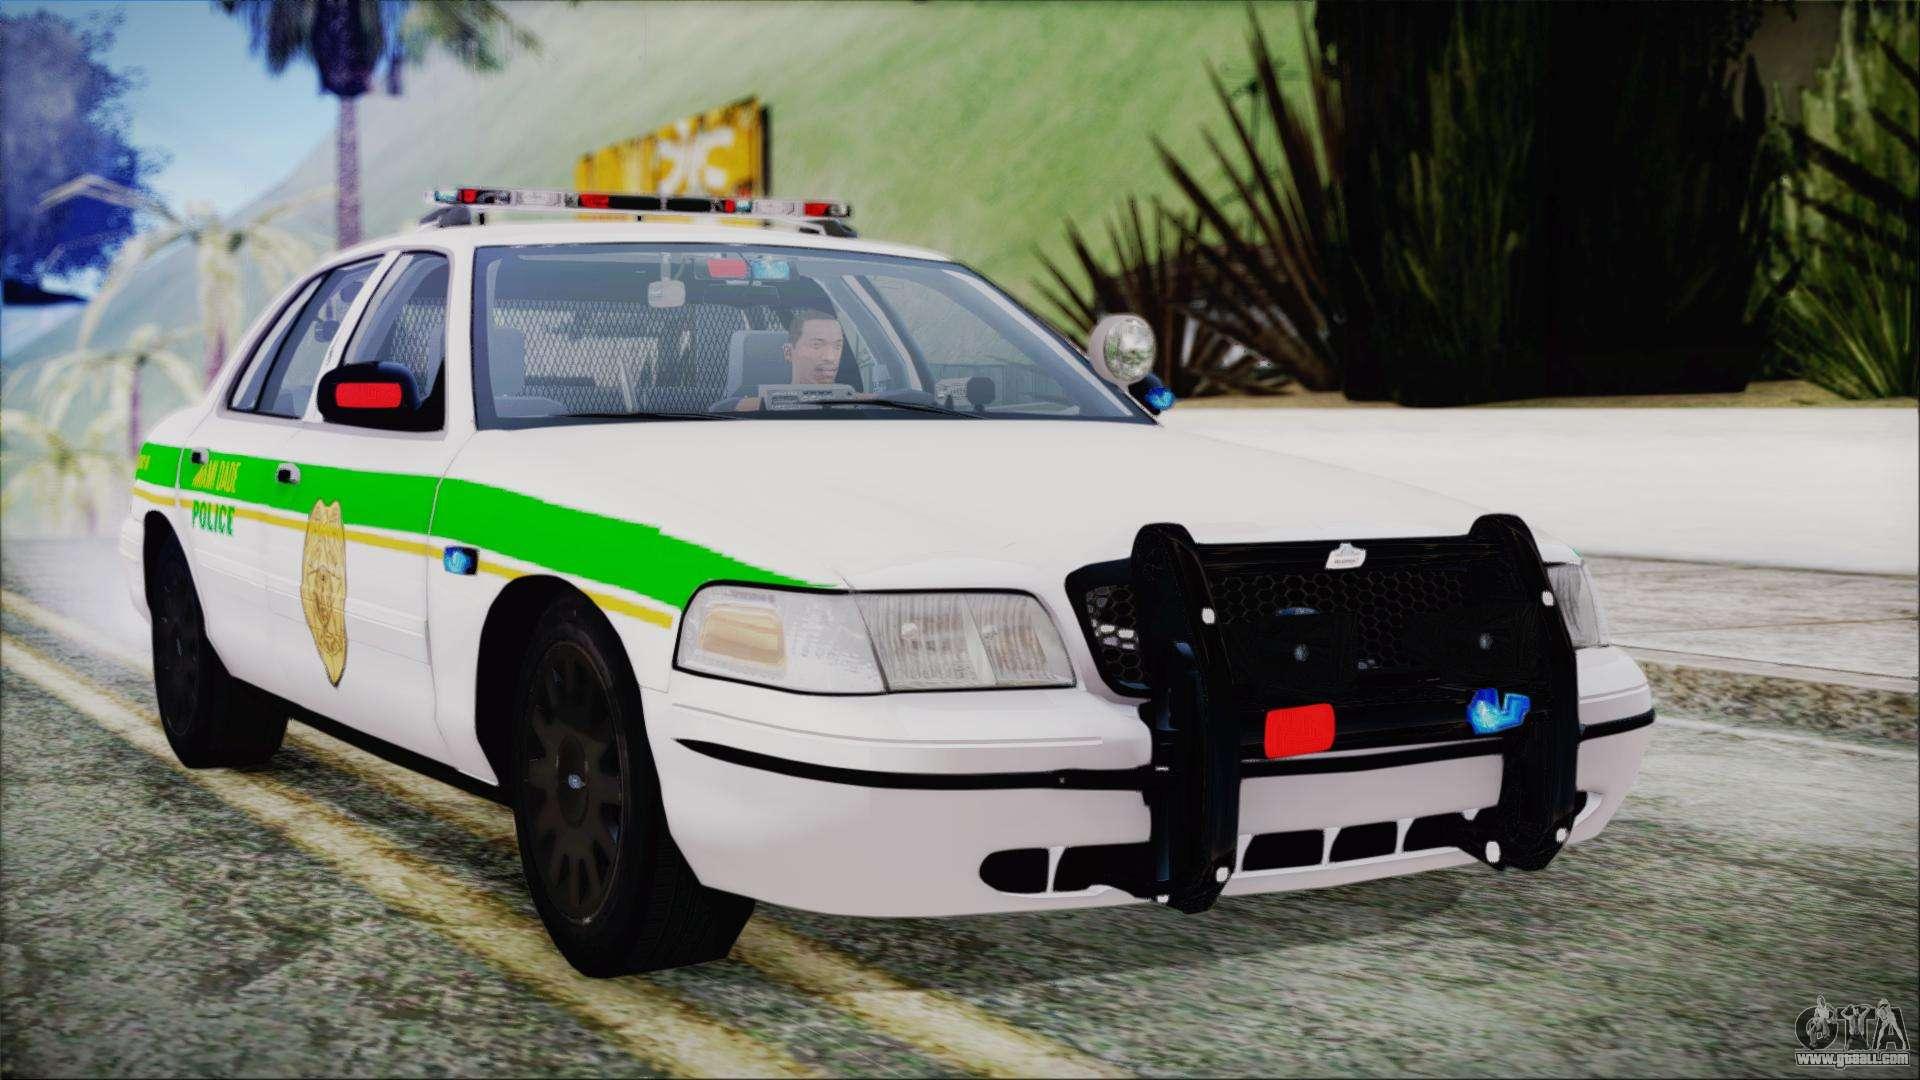 Different codes on GTA: Miami police